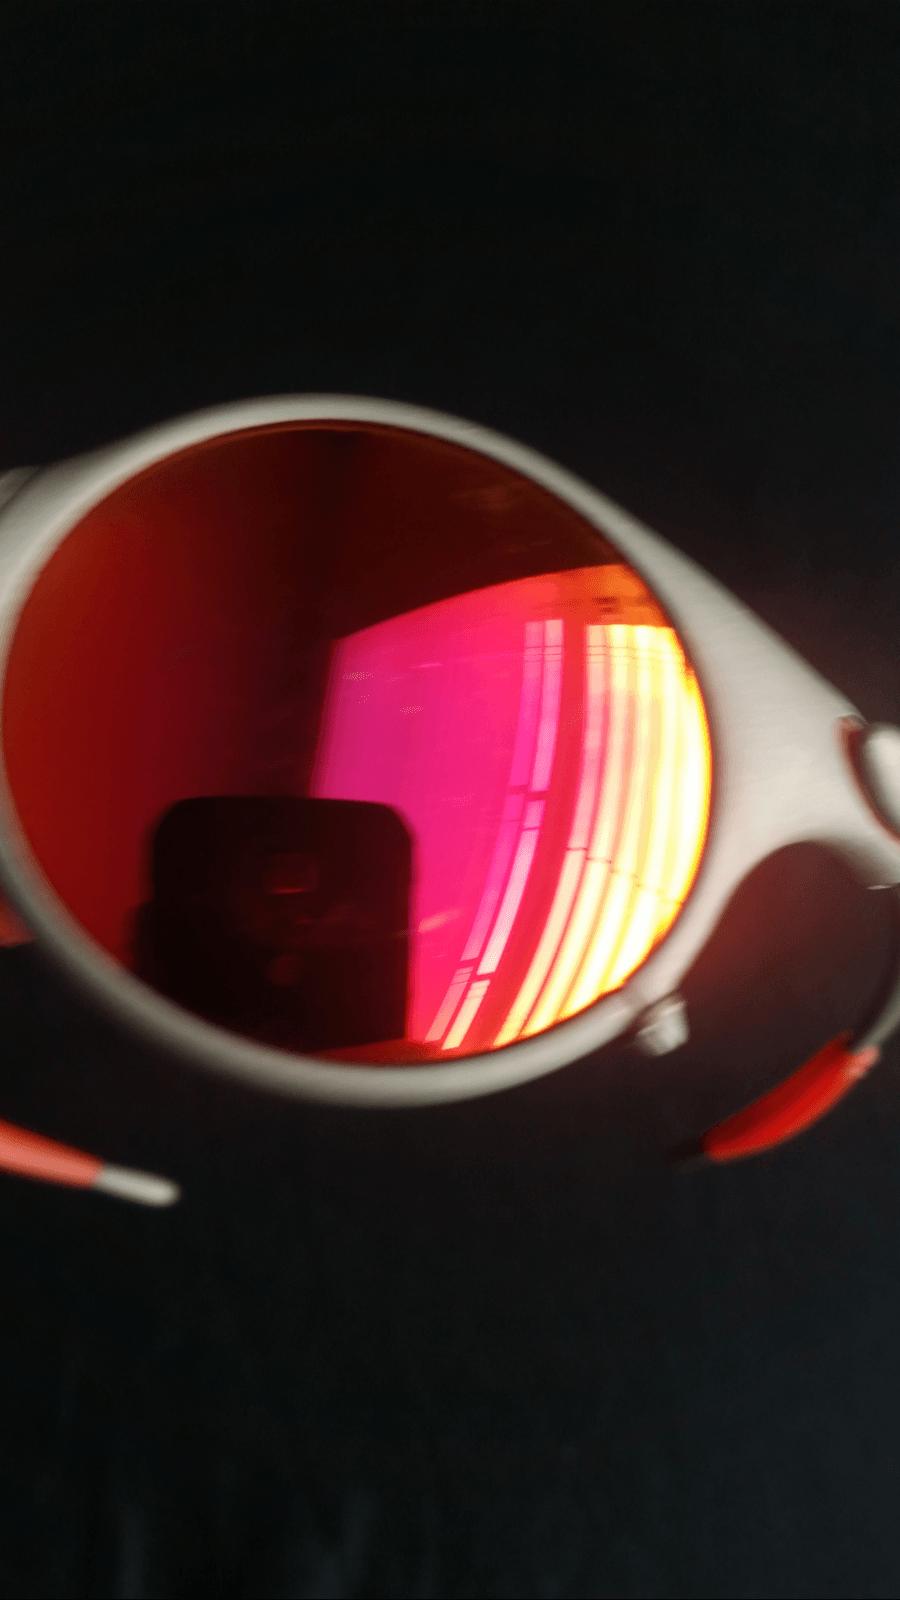 Mars ruby - uploadfromtaptalk1422564248621.png